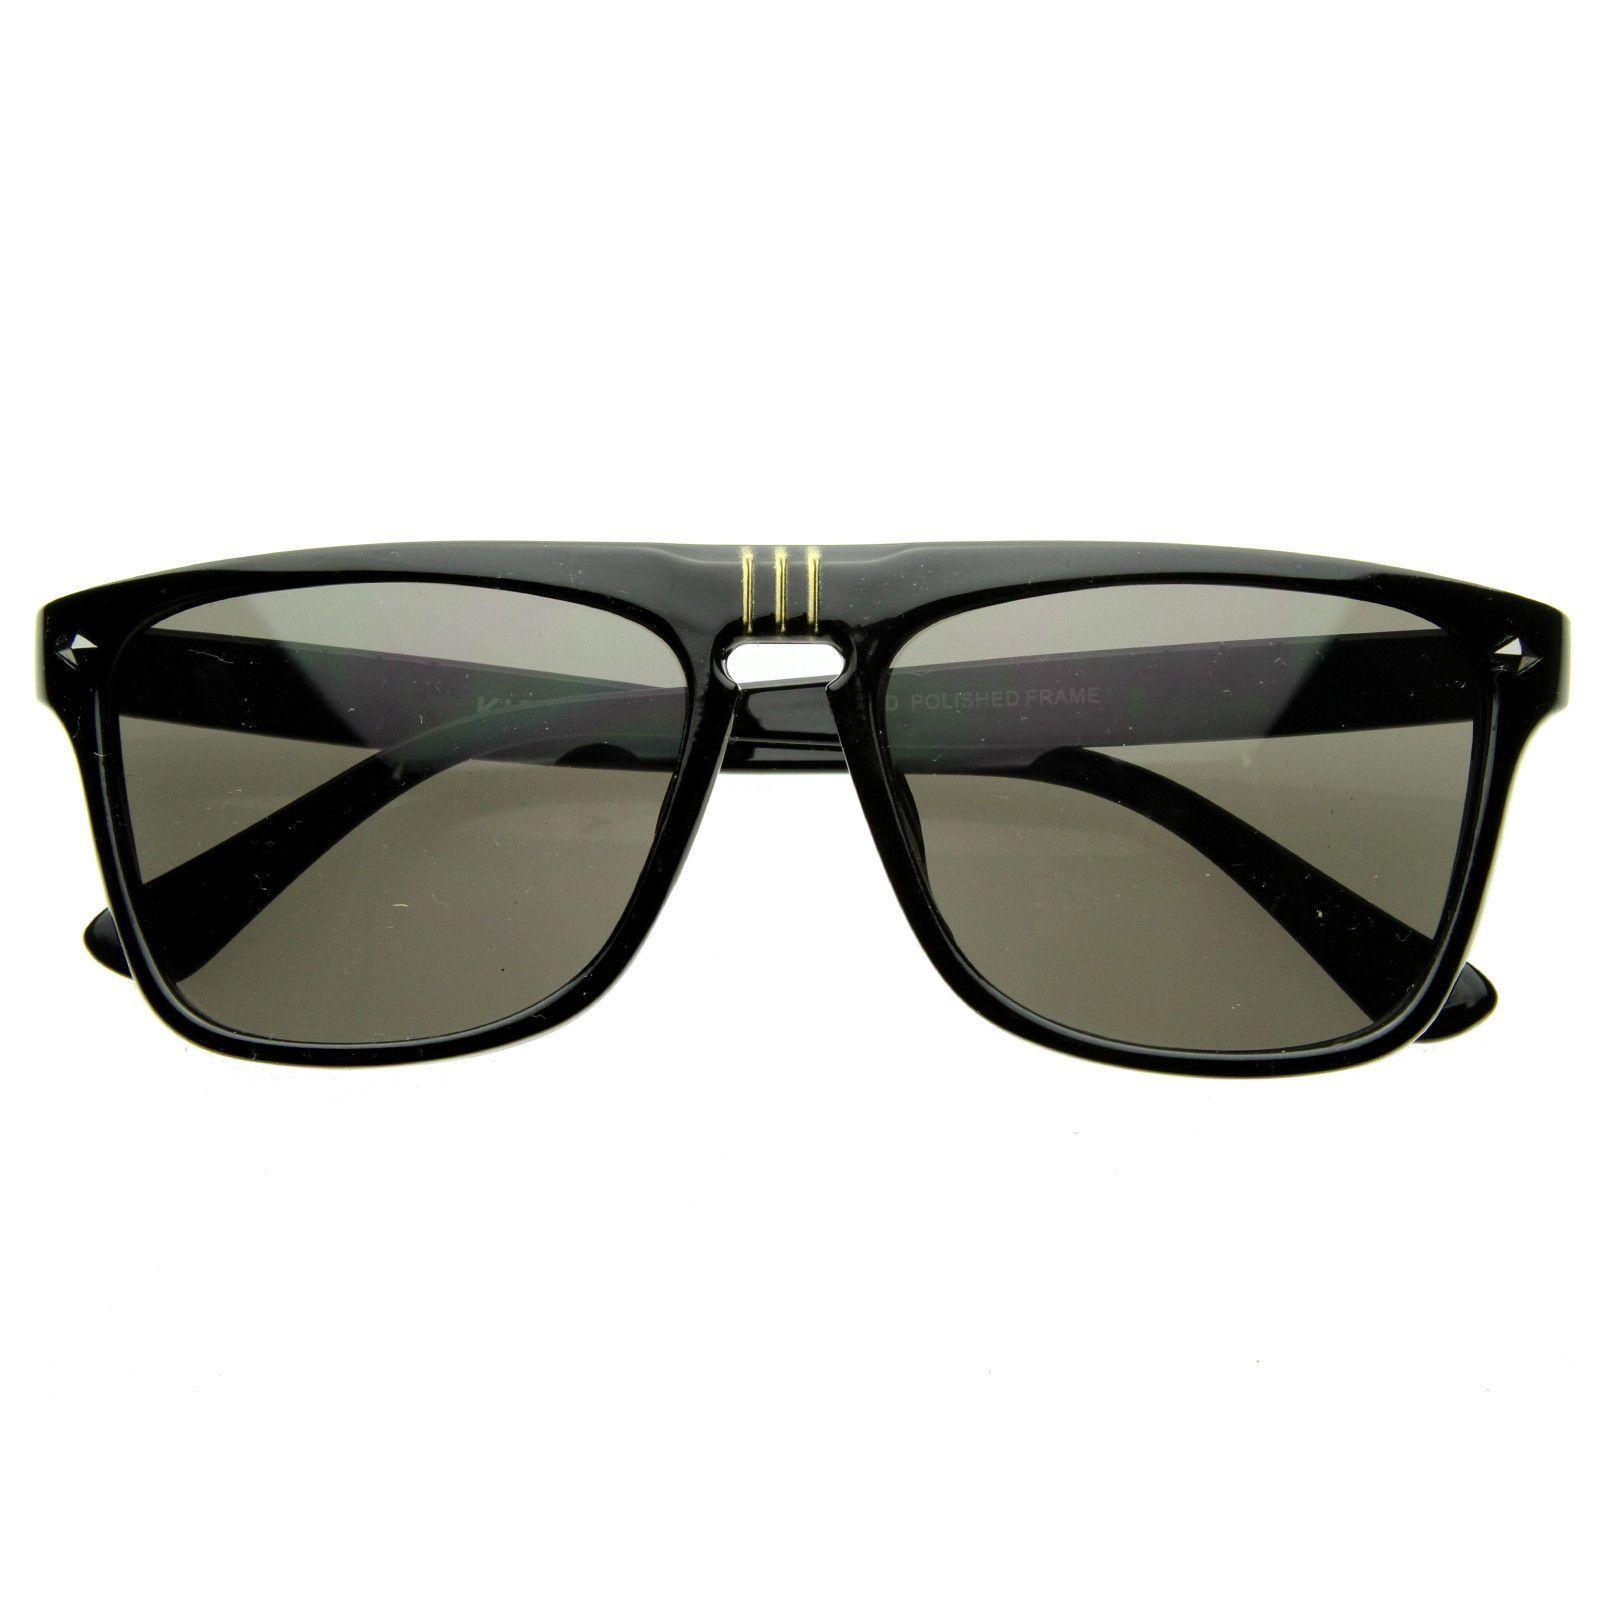 European Mens Designer Flat Top Dapper Sunglasses 8450